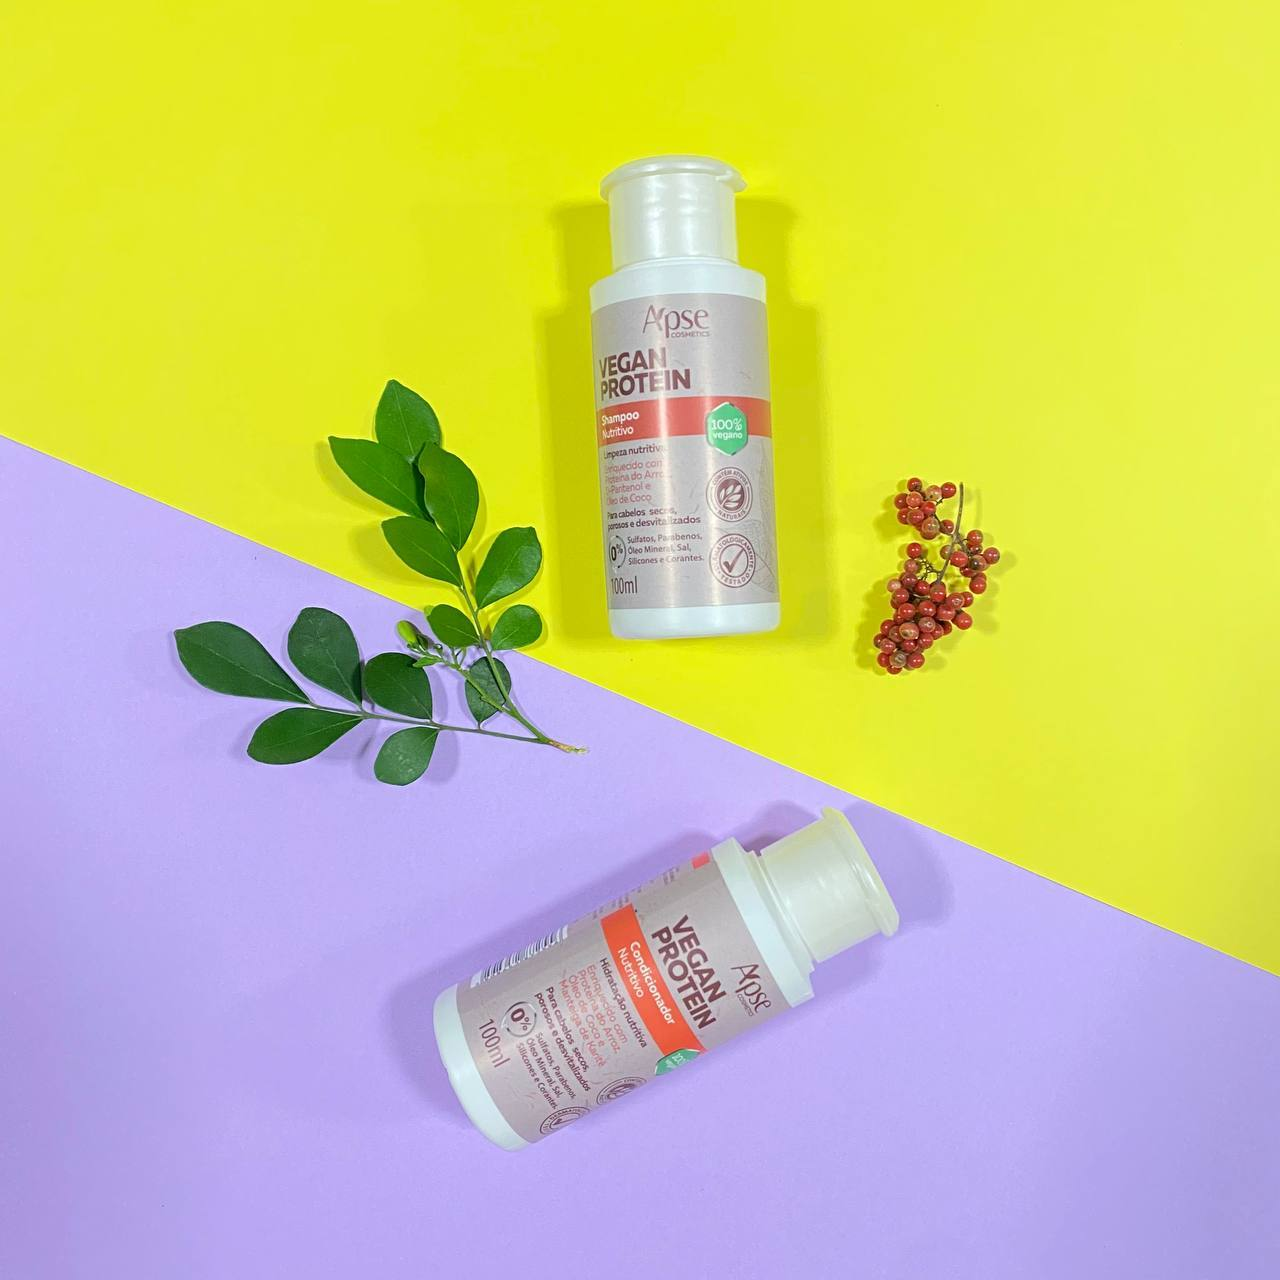 Kit Viagem Vegan - Apse Cosmetics